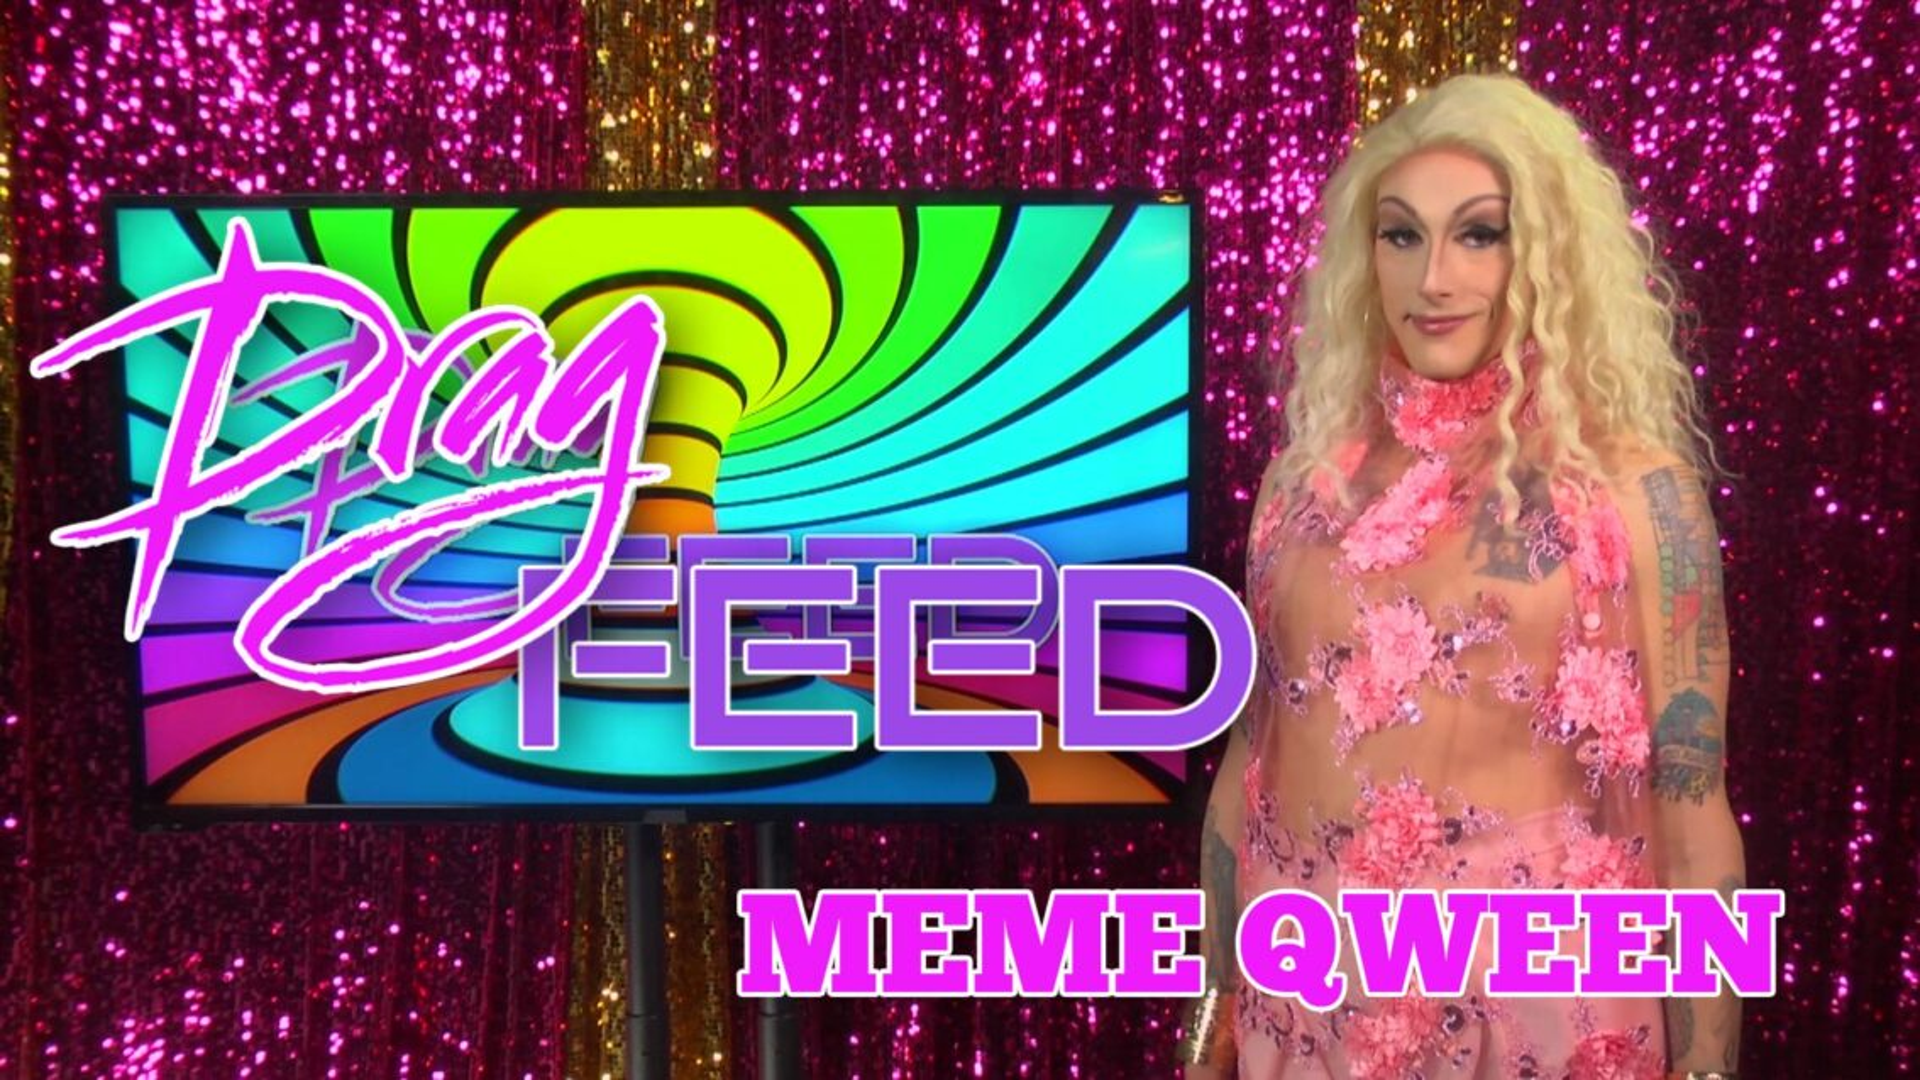 "RuPaul's Drag Race Memes & More! ""Meme Qween"" ft. Maebe A. Girl | Drag Feed"